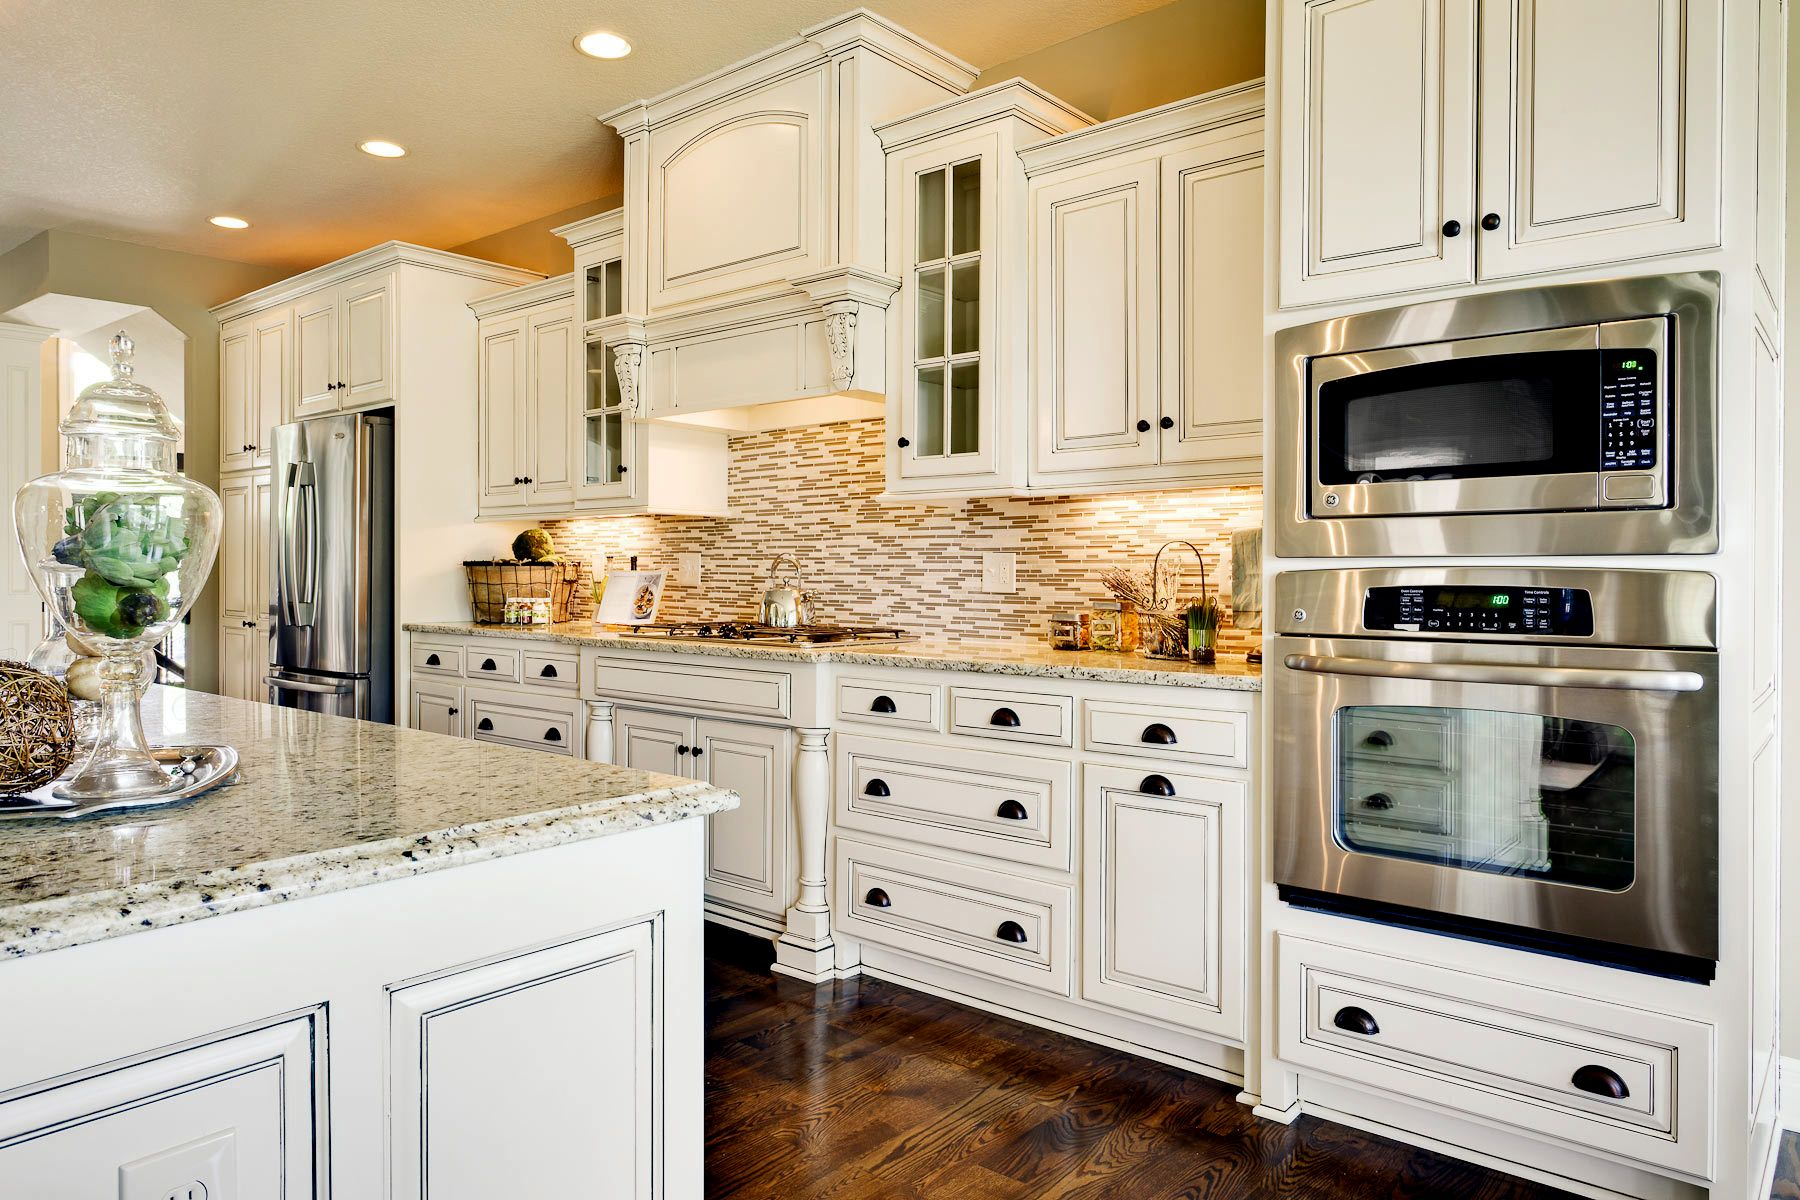 Kitchen Cabinet Distributor Nashville Tn Procraft Cabinetry